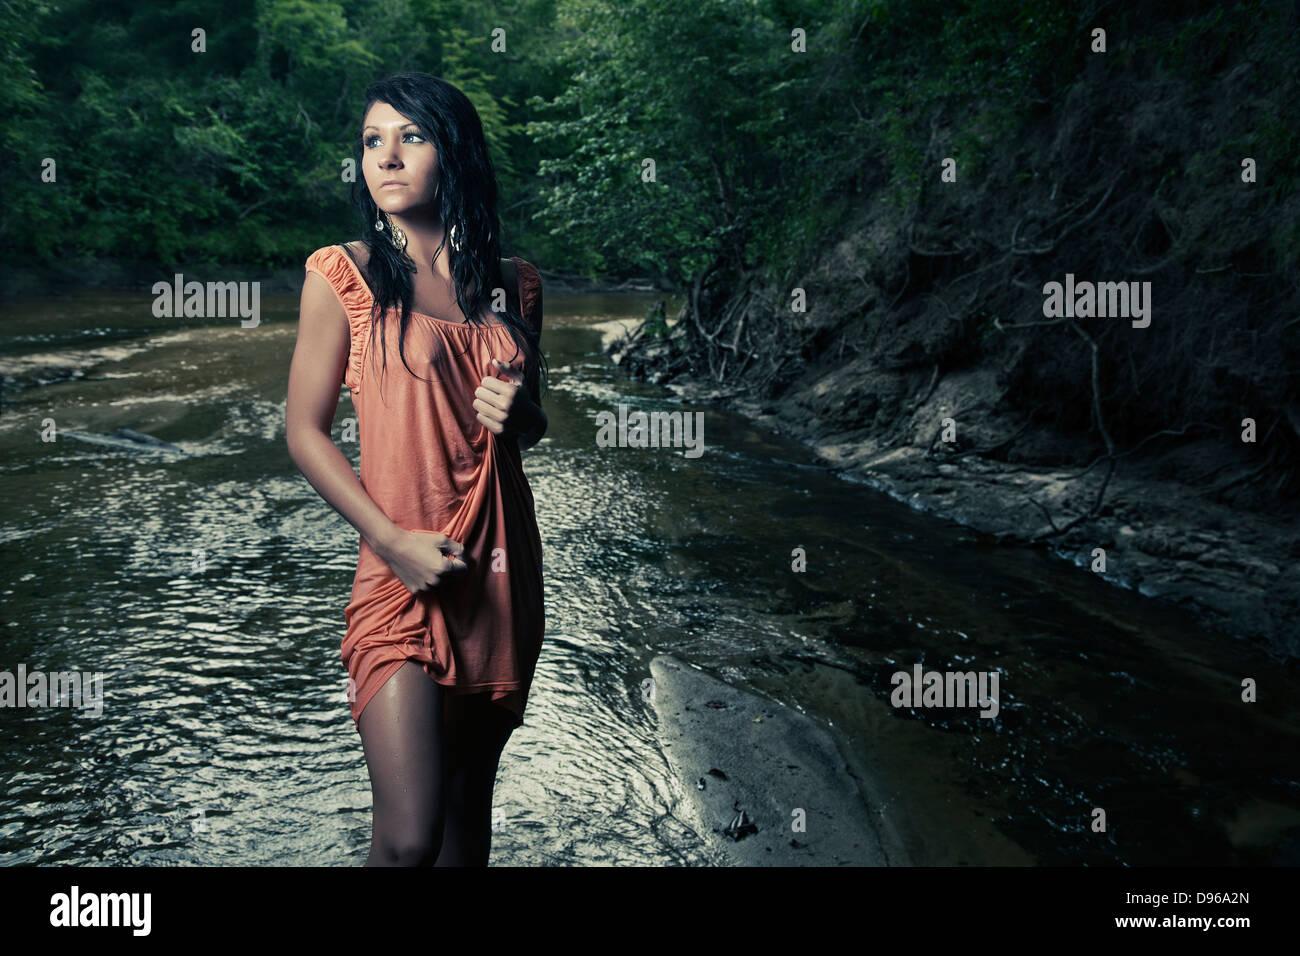 Donna in abiti bagnati in piedi in creek Immagini Stock